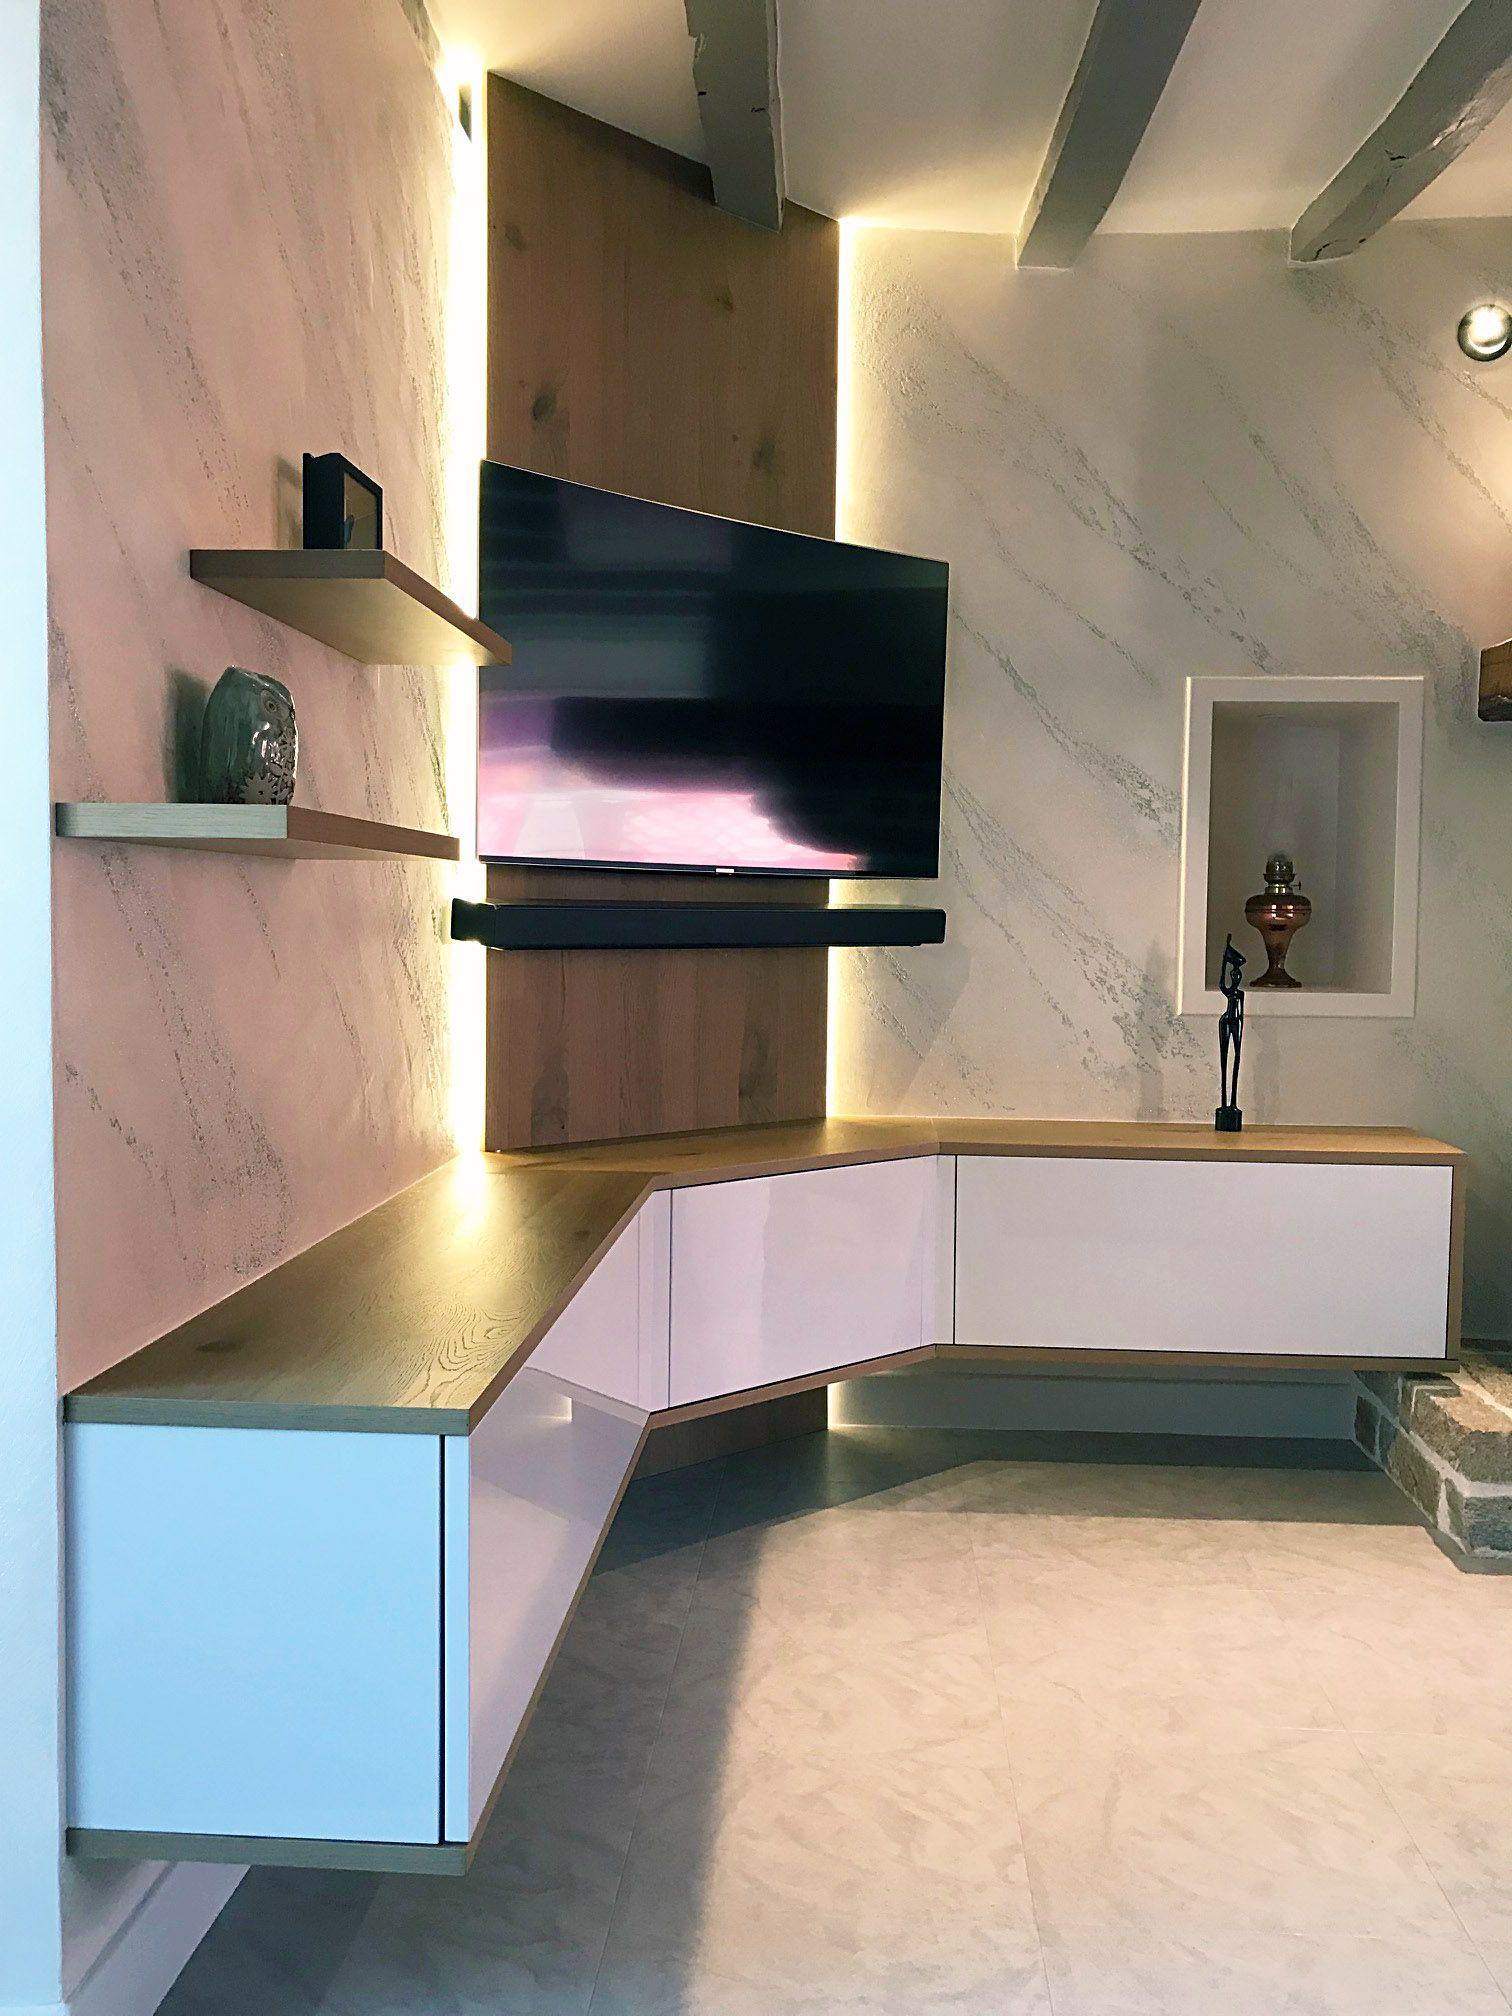 Makeover Of The Living Room With A New Suspended Tv Stand Knot Oak Finish Goruntuler Ile Ev Dekorasyon Fikirleri Ev Icin Ev Dekorasyonu